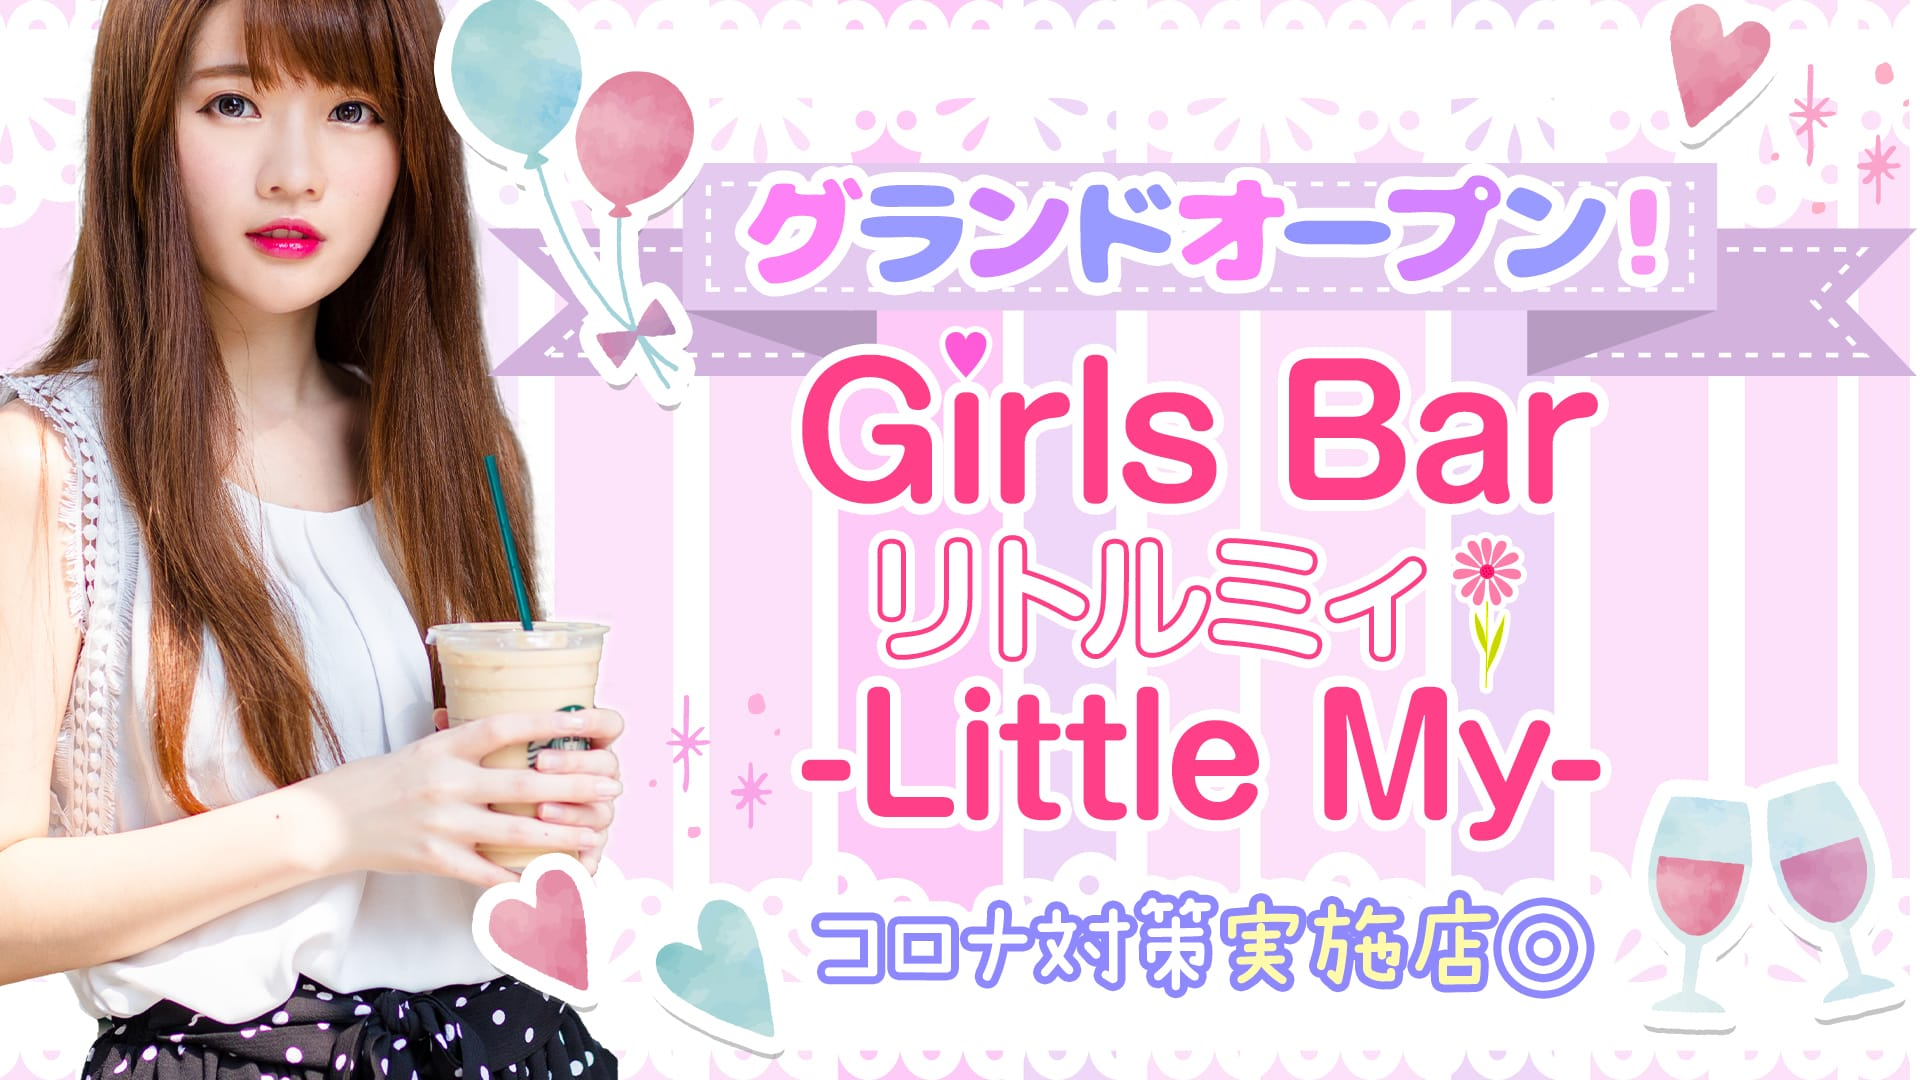 Little My(リトル ミイ) 池袋ガールズバー TOP画像